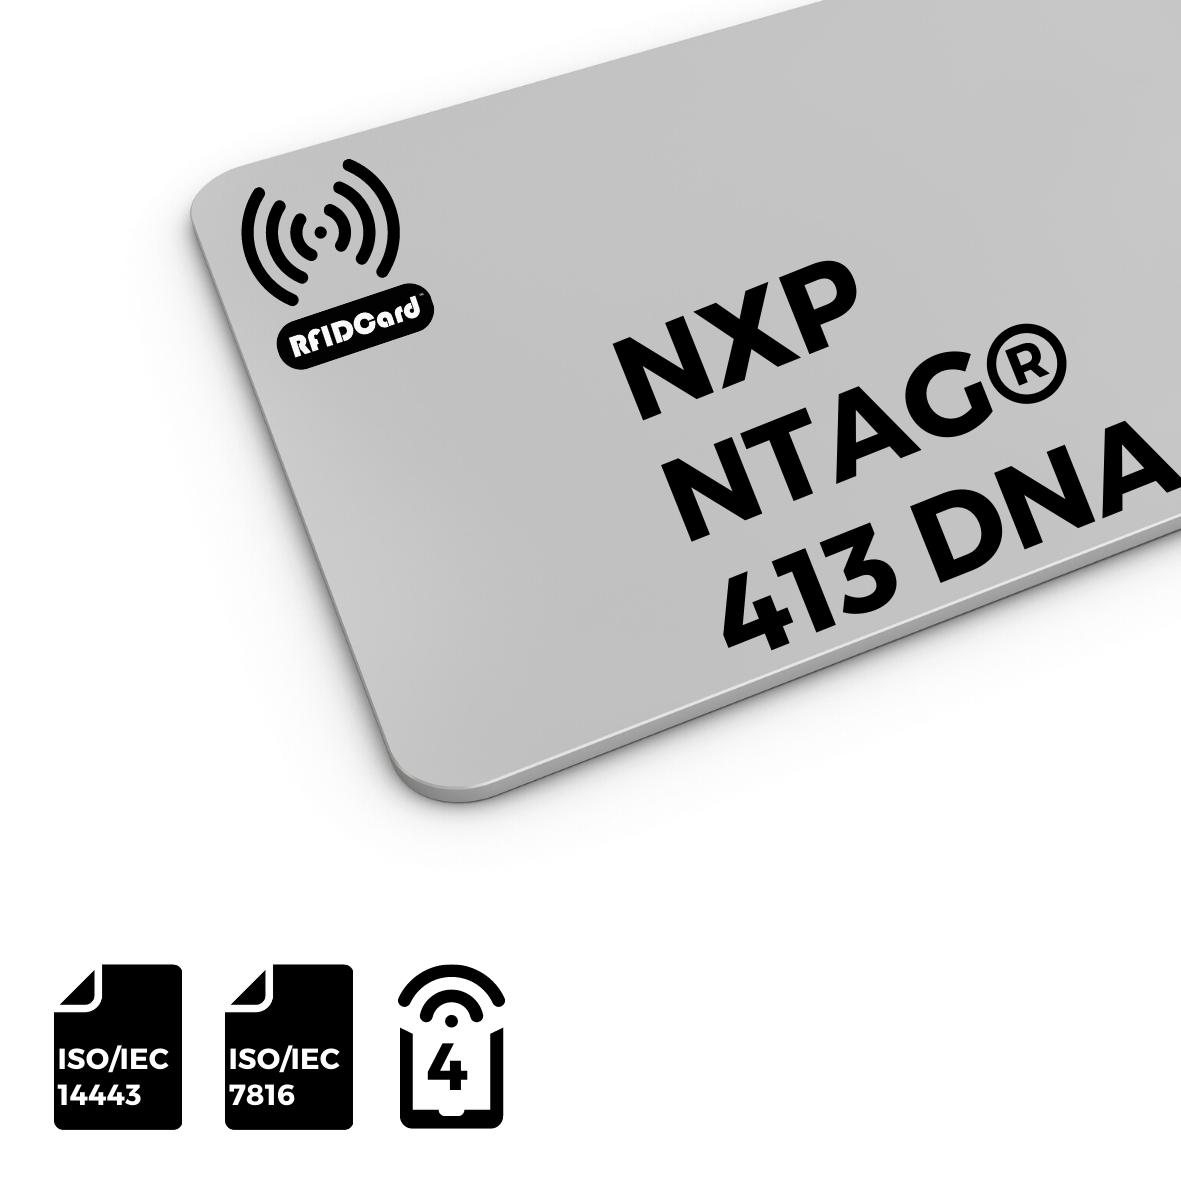 NXP NTAG®413 DNA NFC CARD